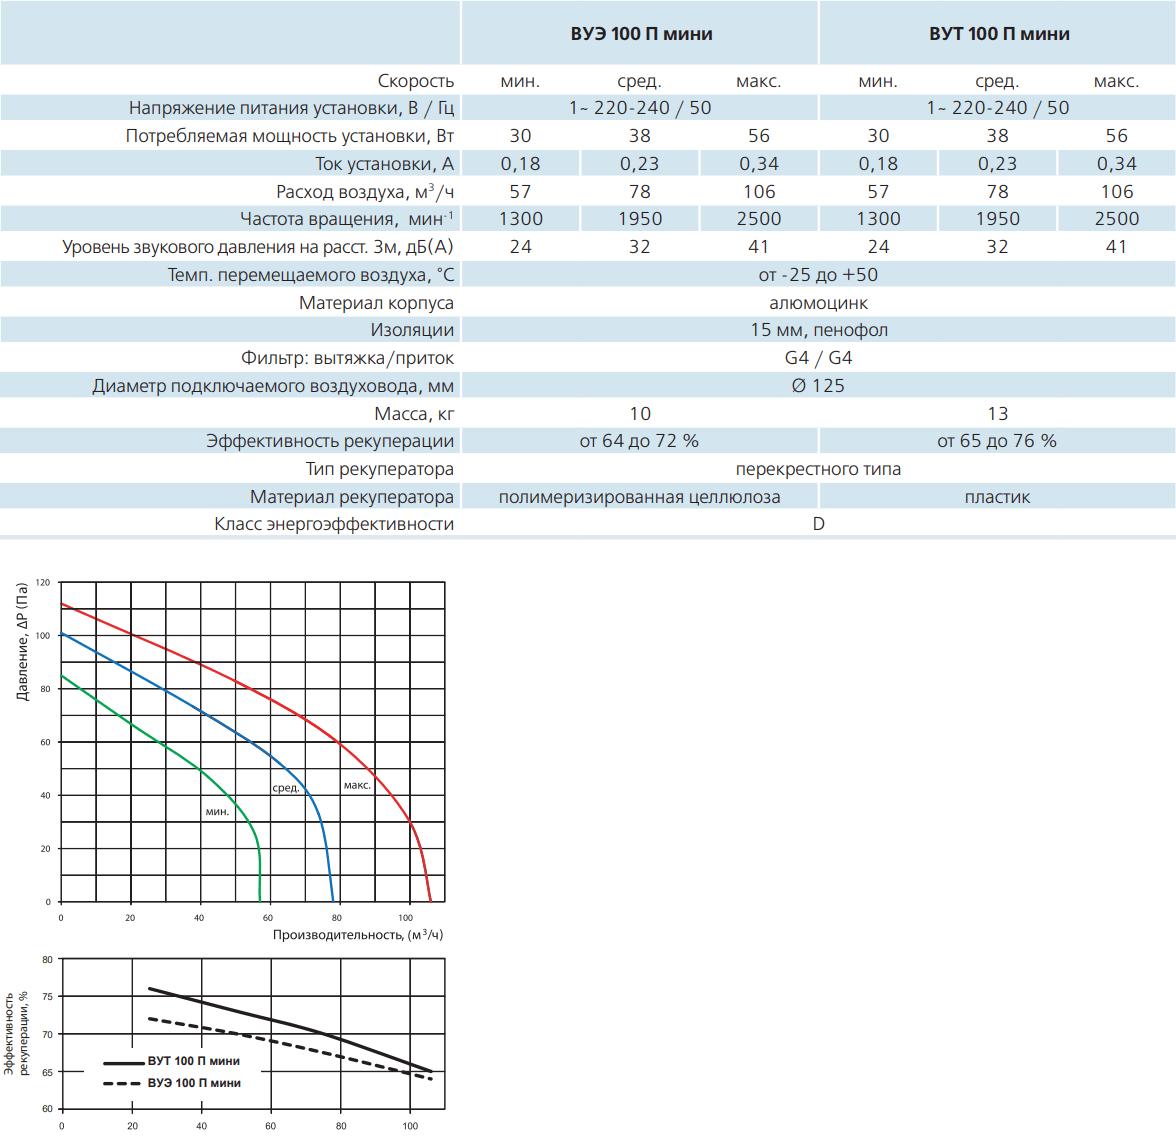 Приточно-вытяжная установка Вентс ВУТ/ВУЭ 100 П мини - Технические характеристики